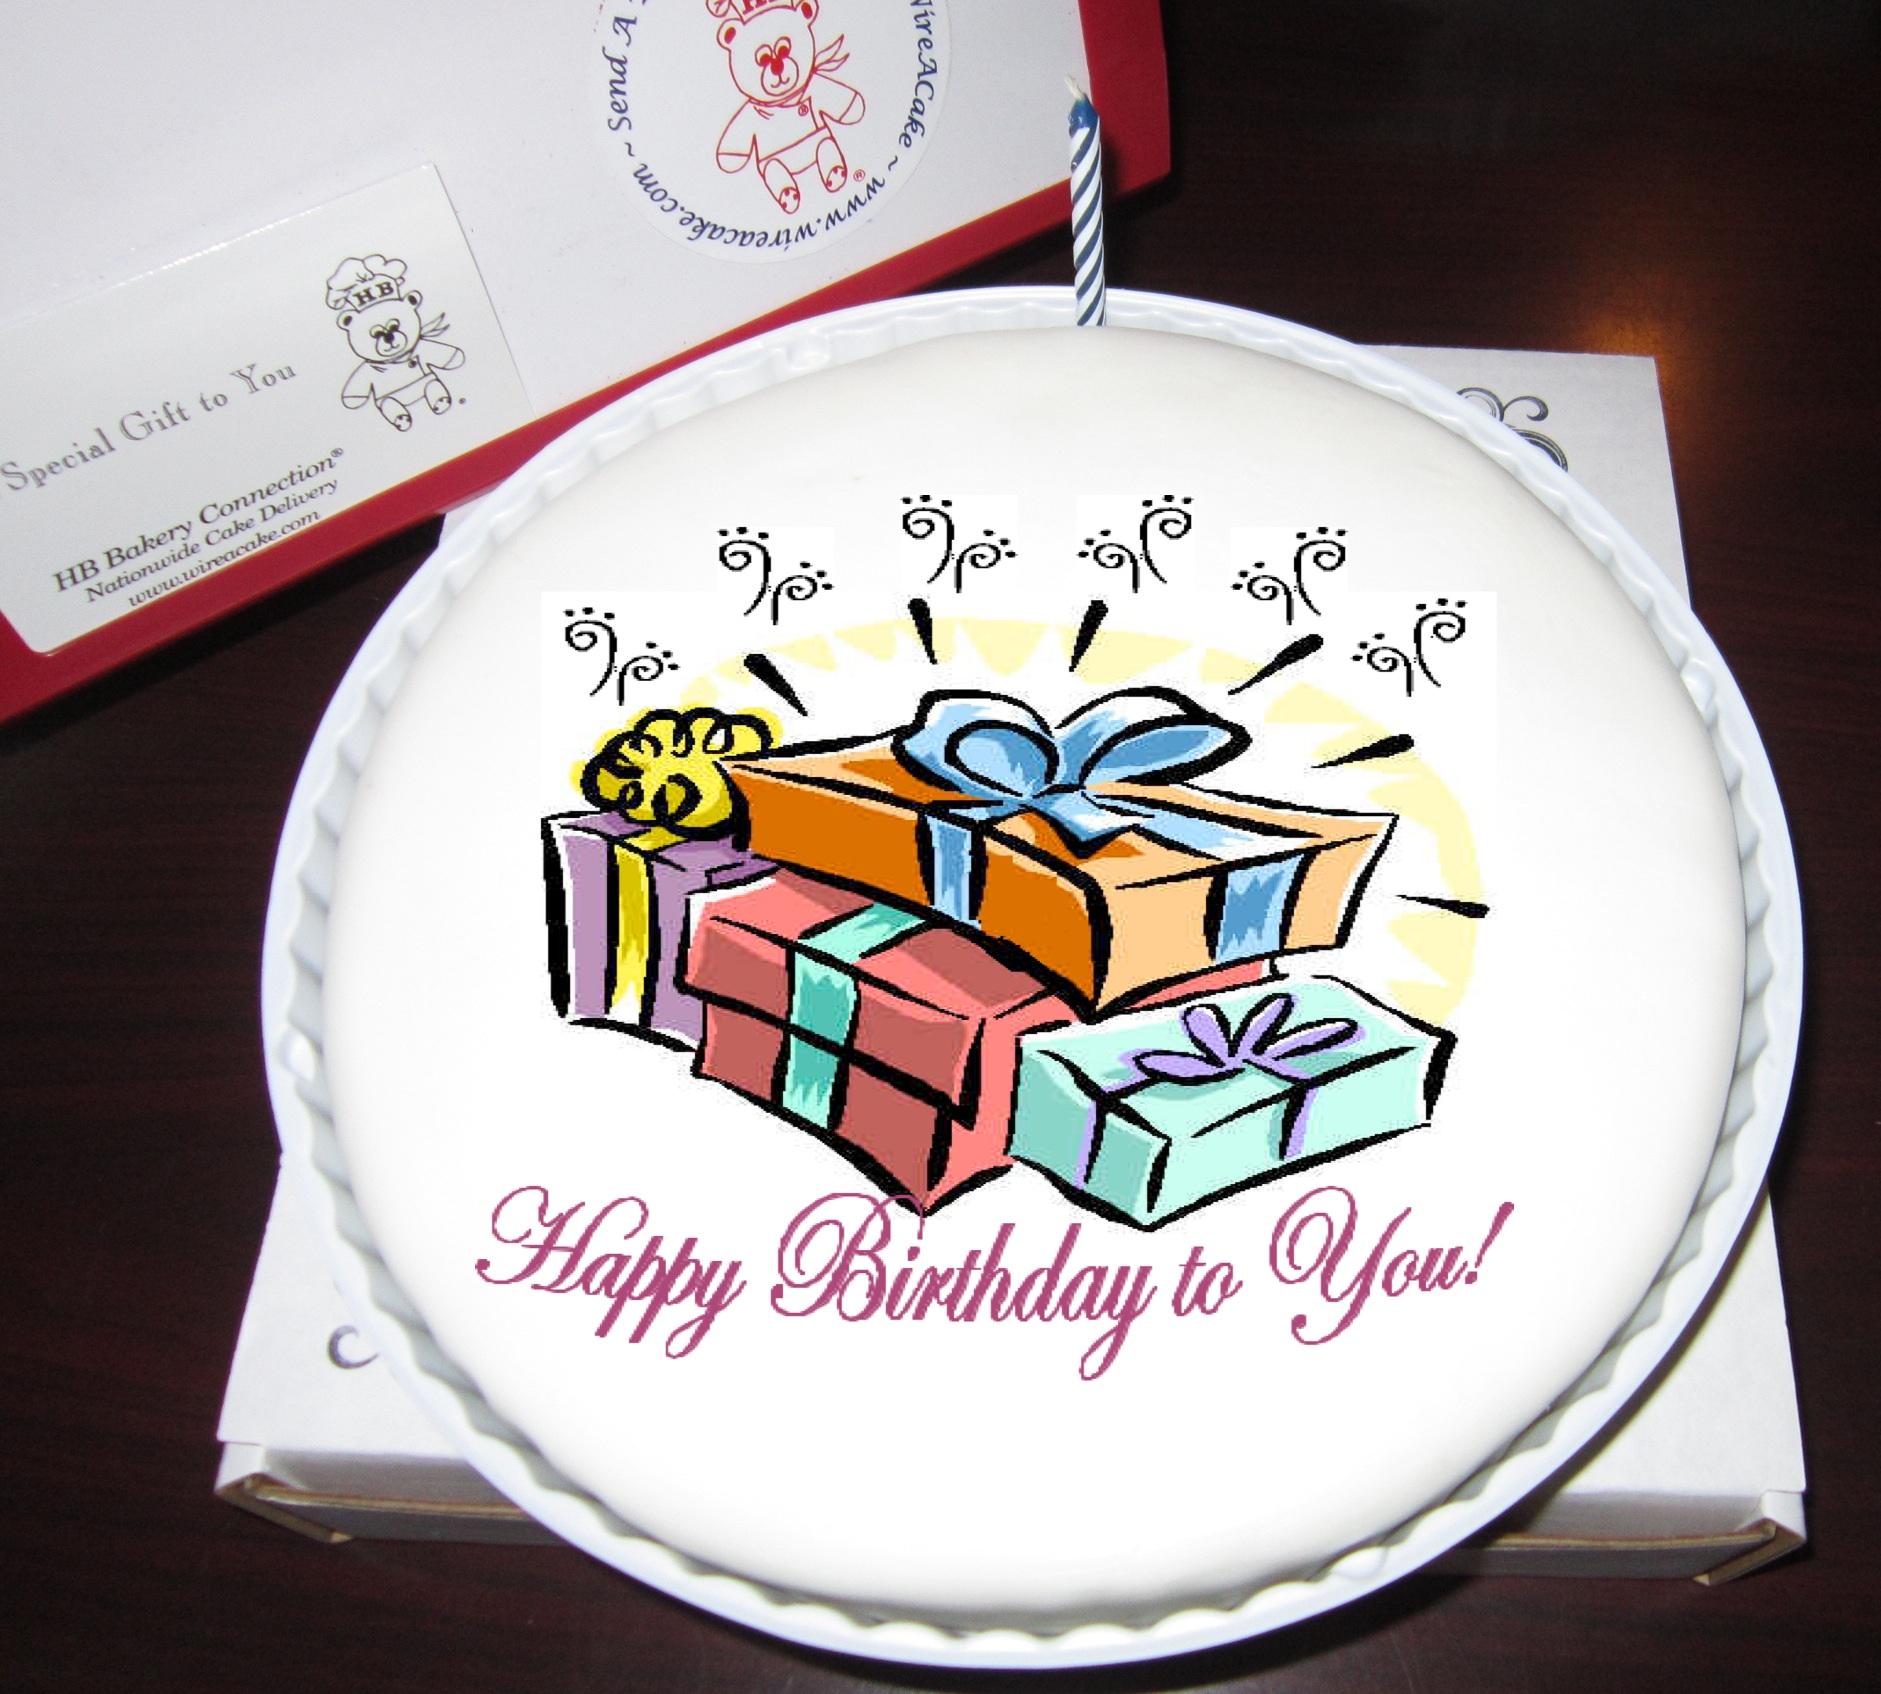 Outstanding Sams Club Wedding Cake Pics Designs   Dievoon